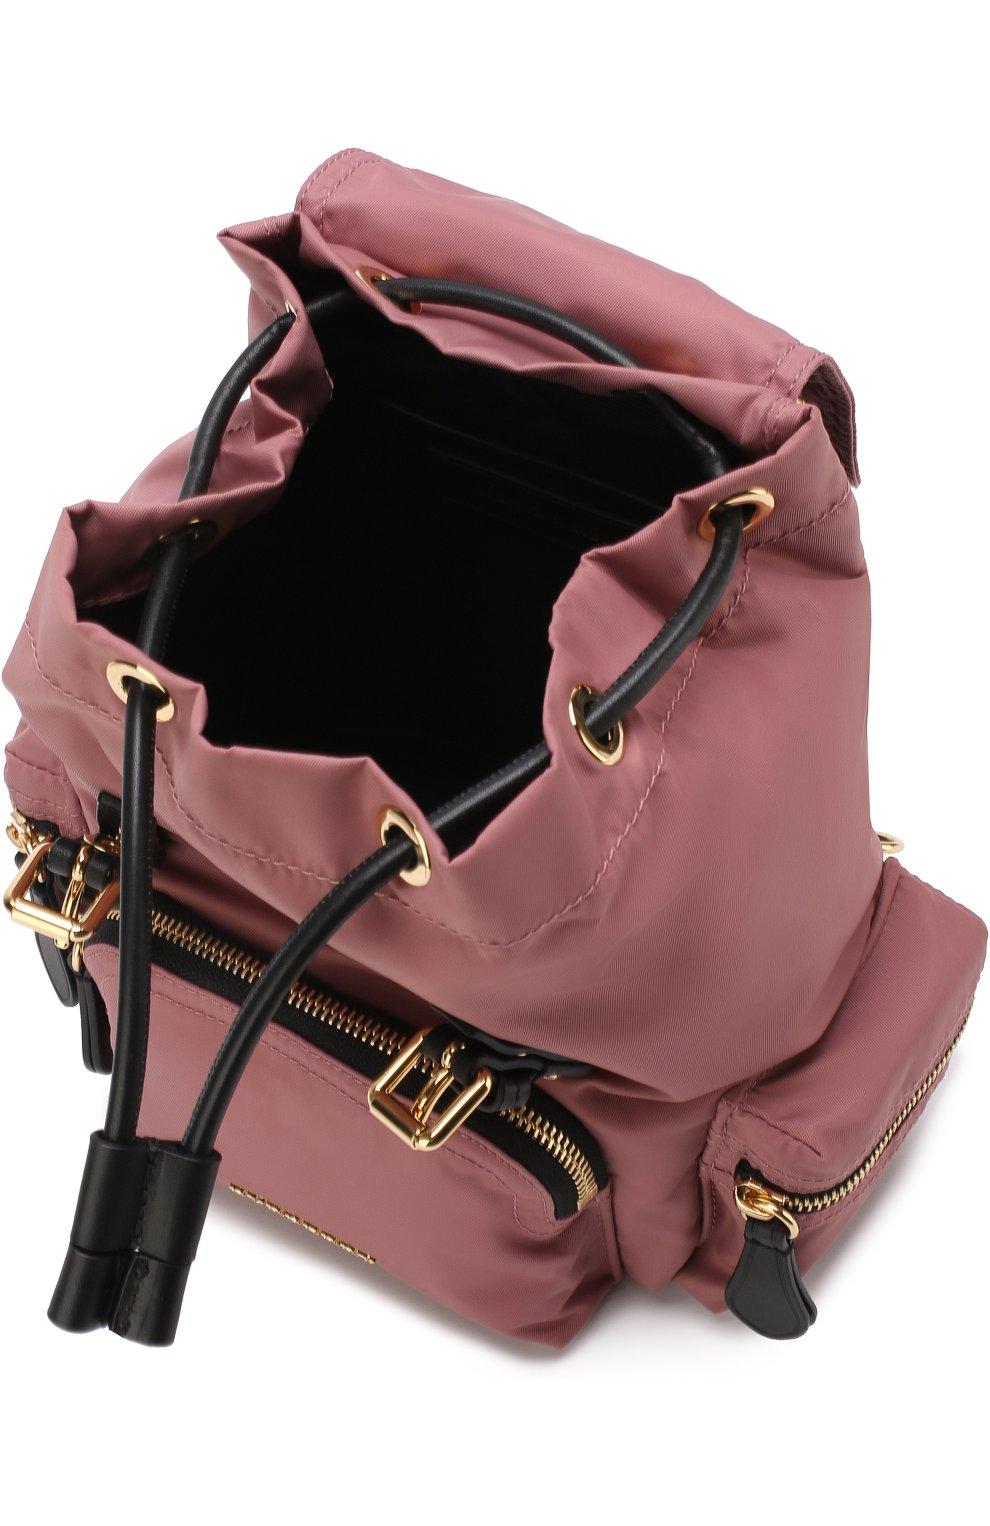 Рюкзак Rucksack small с кожаной отделкой | Фото №4